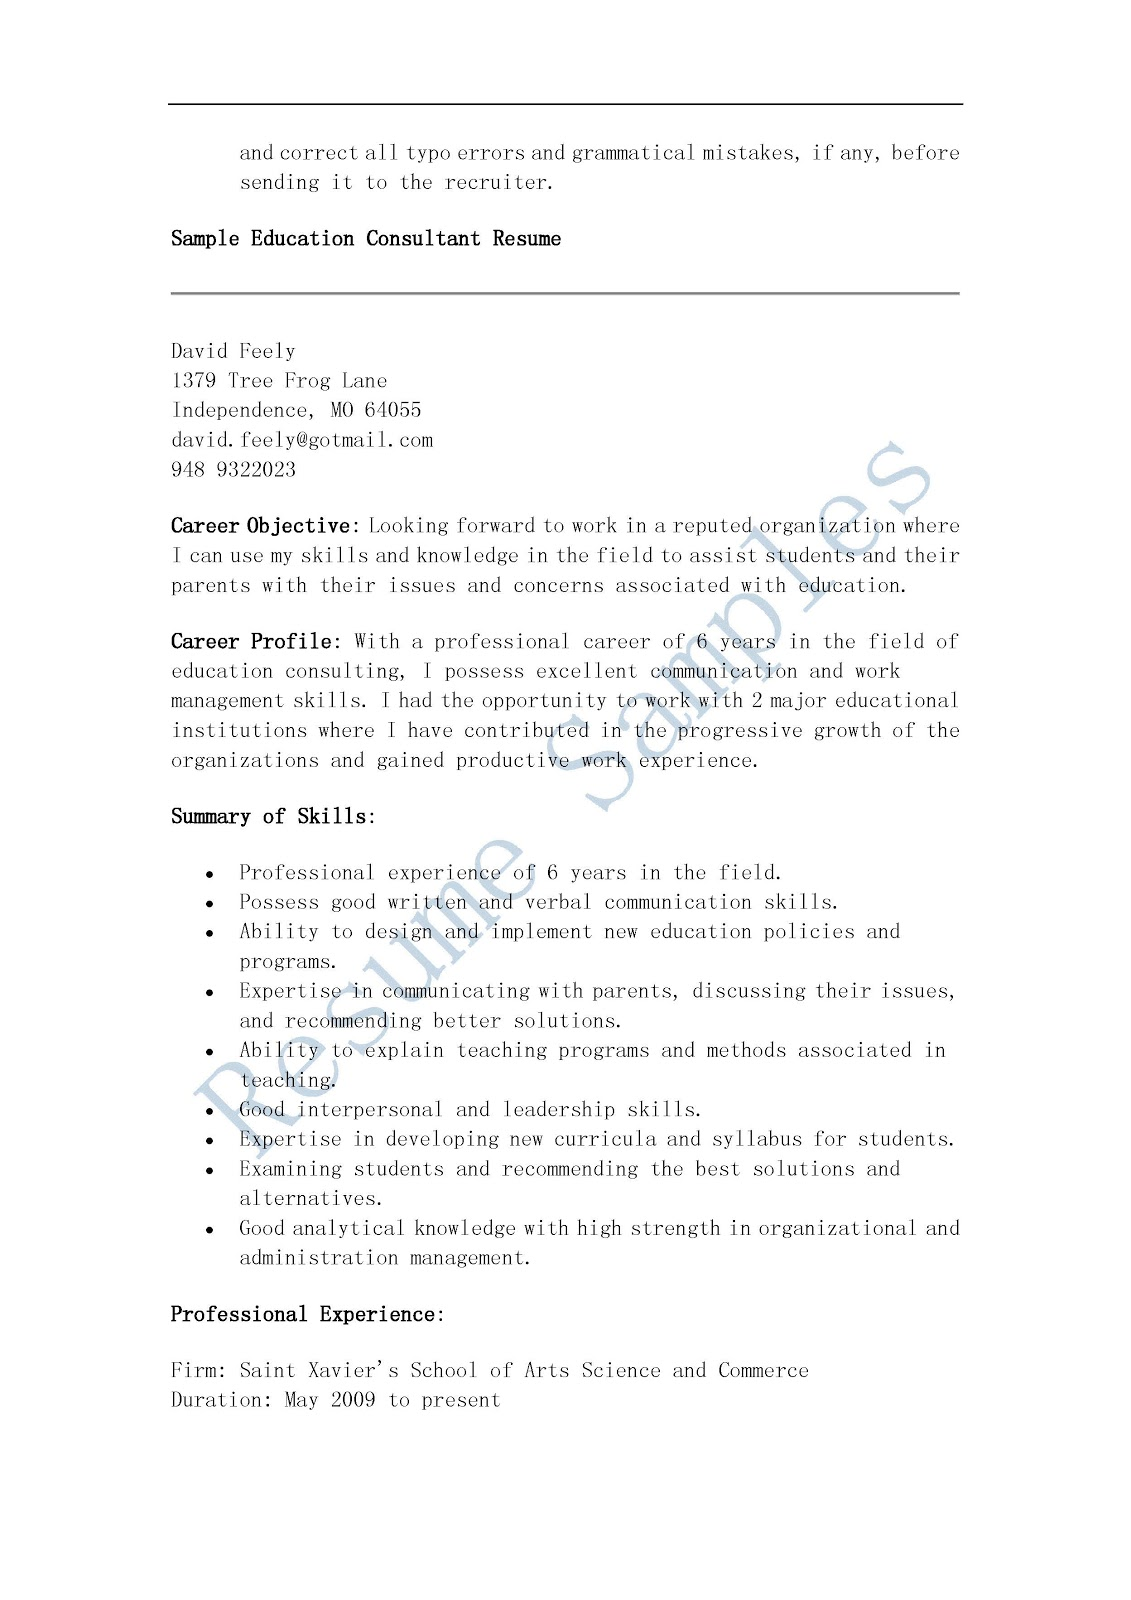 Resume Samples Education Consultant